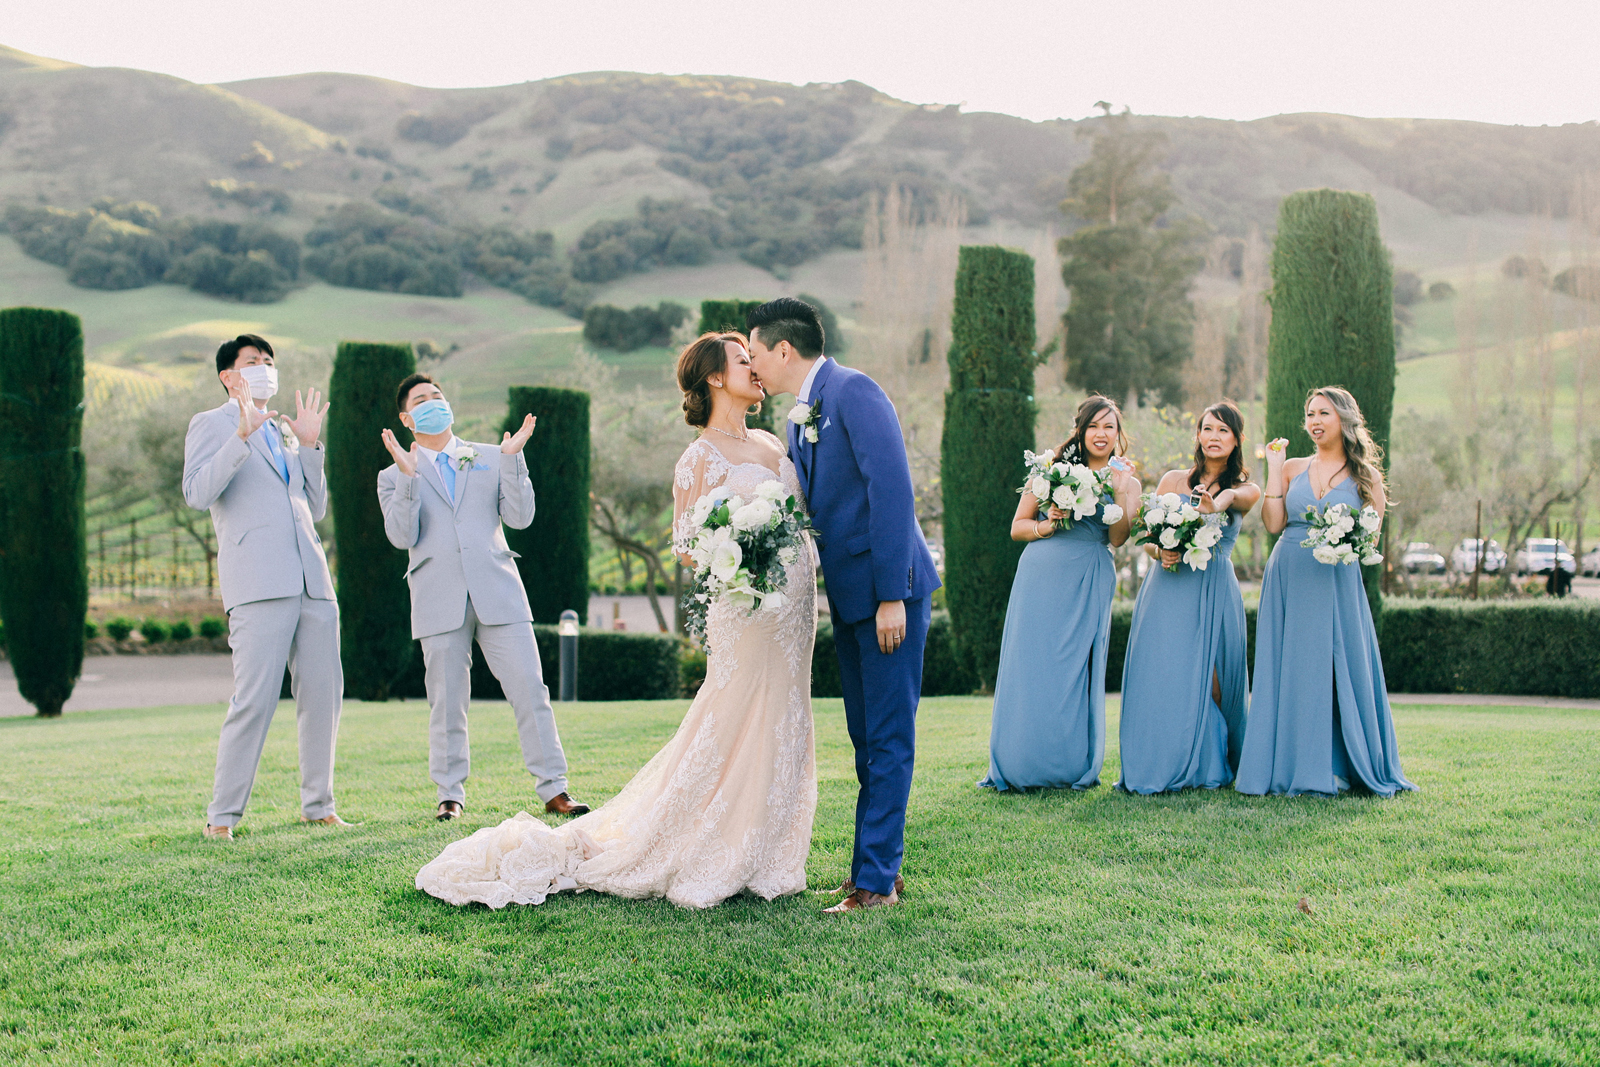 Julienne-Derrick-Covid-19-Wedding-Lyka-Mac-Photography-Tan-Weddings-Events-Planning-Design-Production